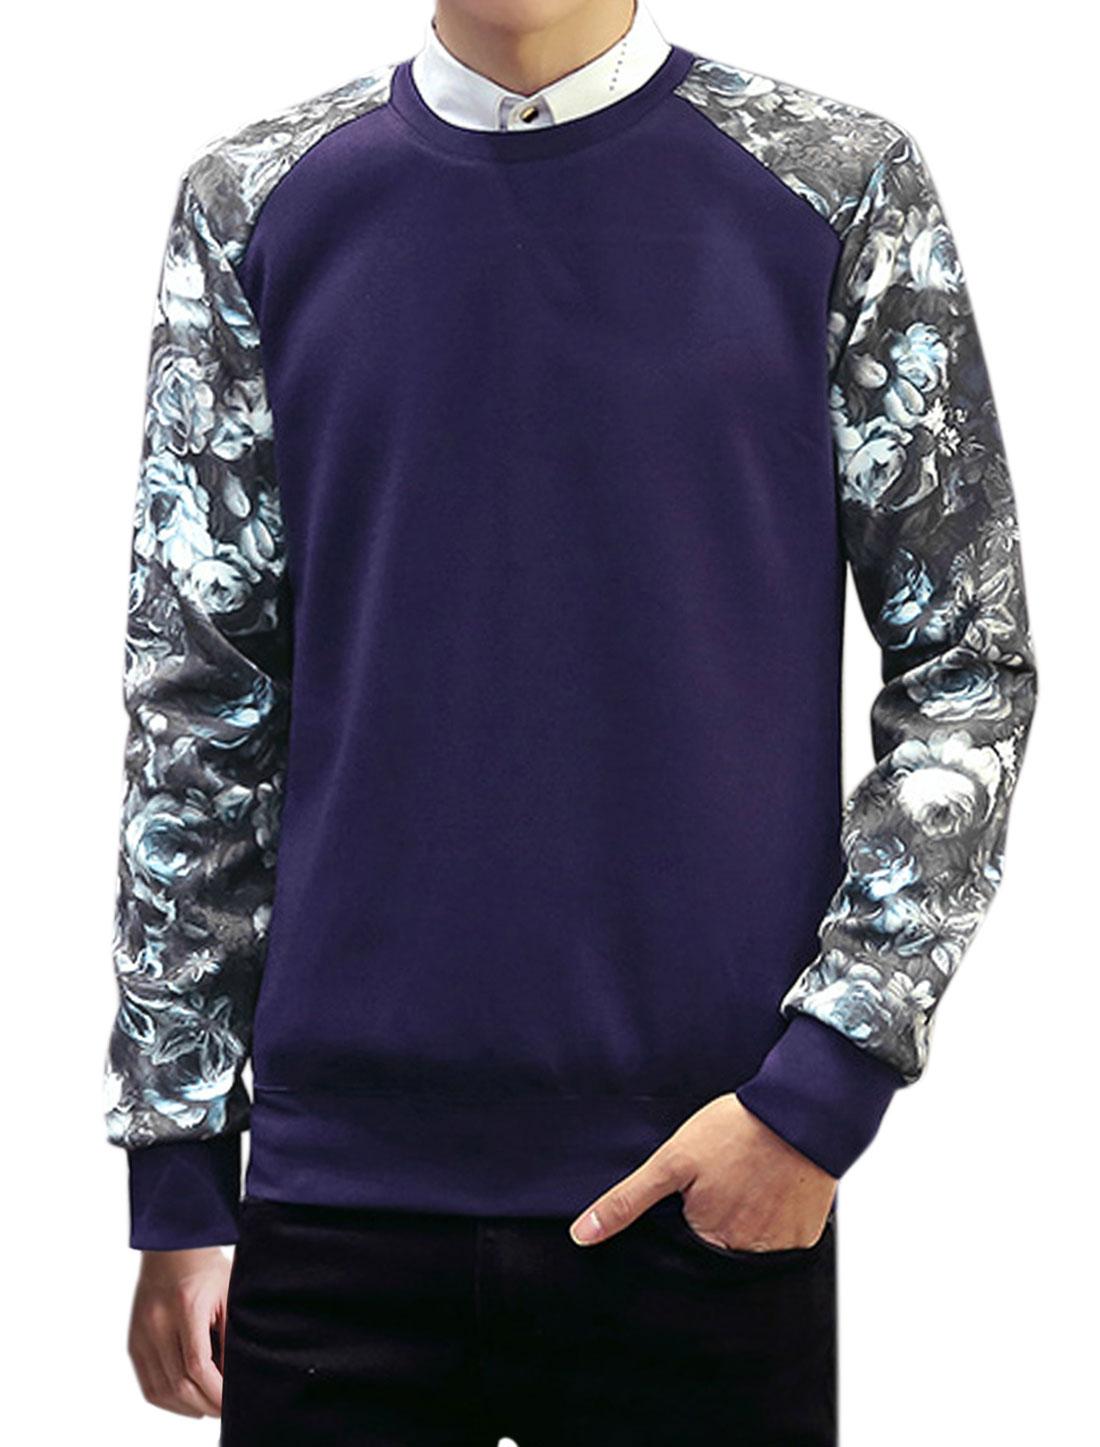 Men Long Sleeves Crew Neck Floral Print Casual Sweatshirt Blue M